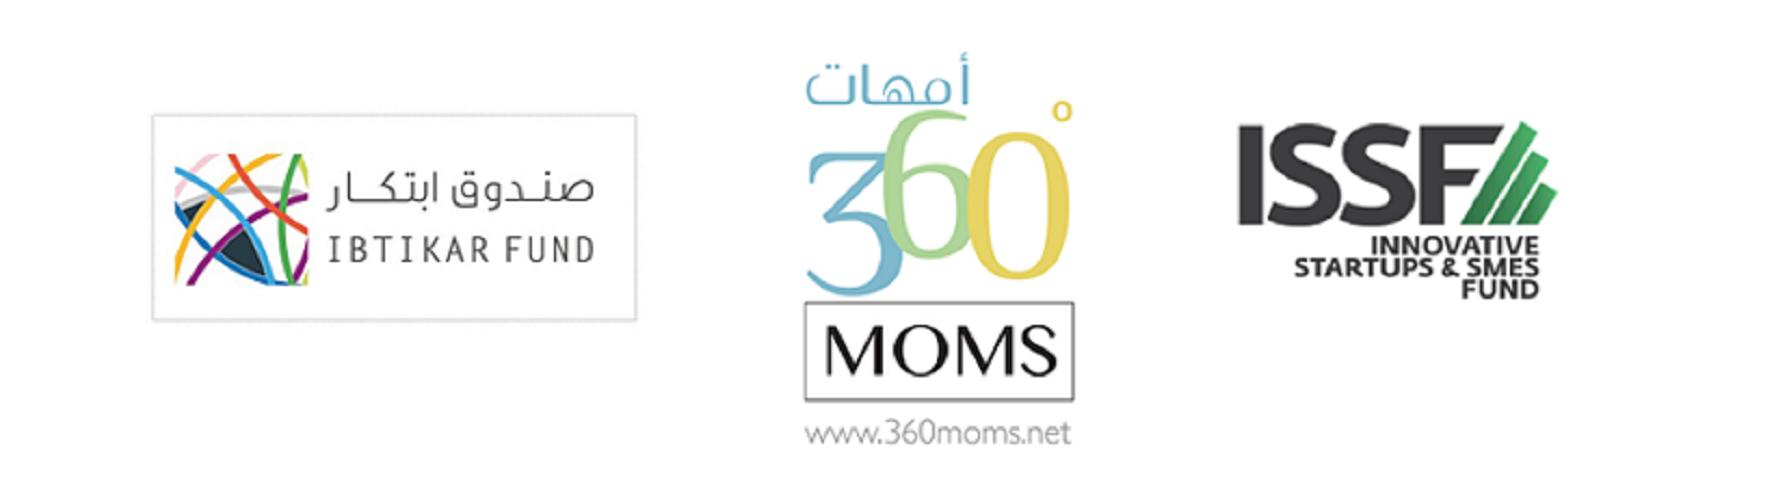 360Moms raises fresh funds